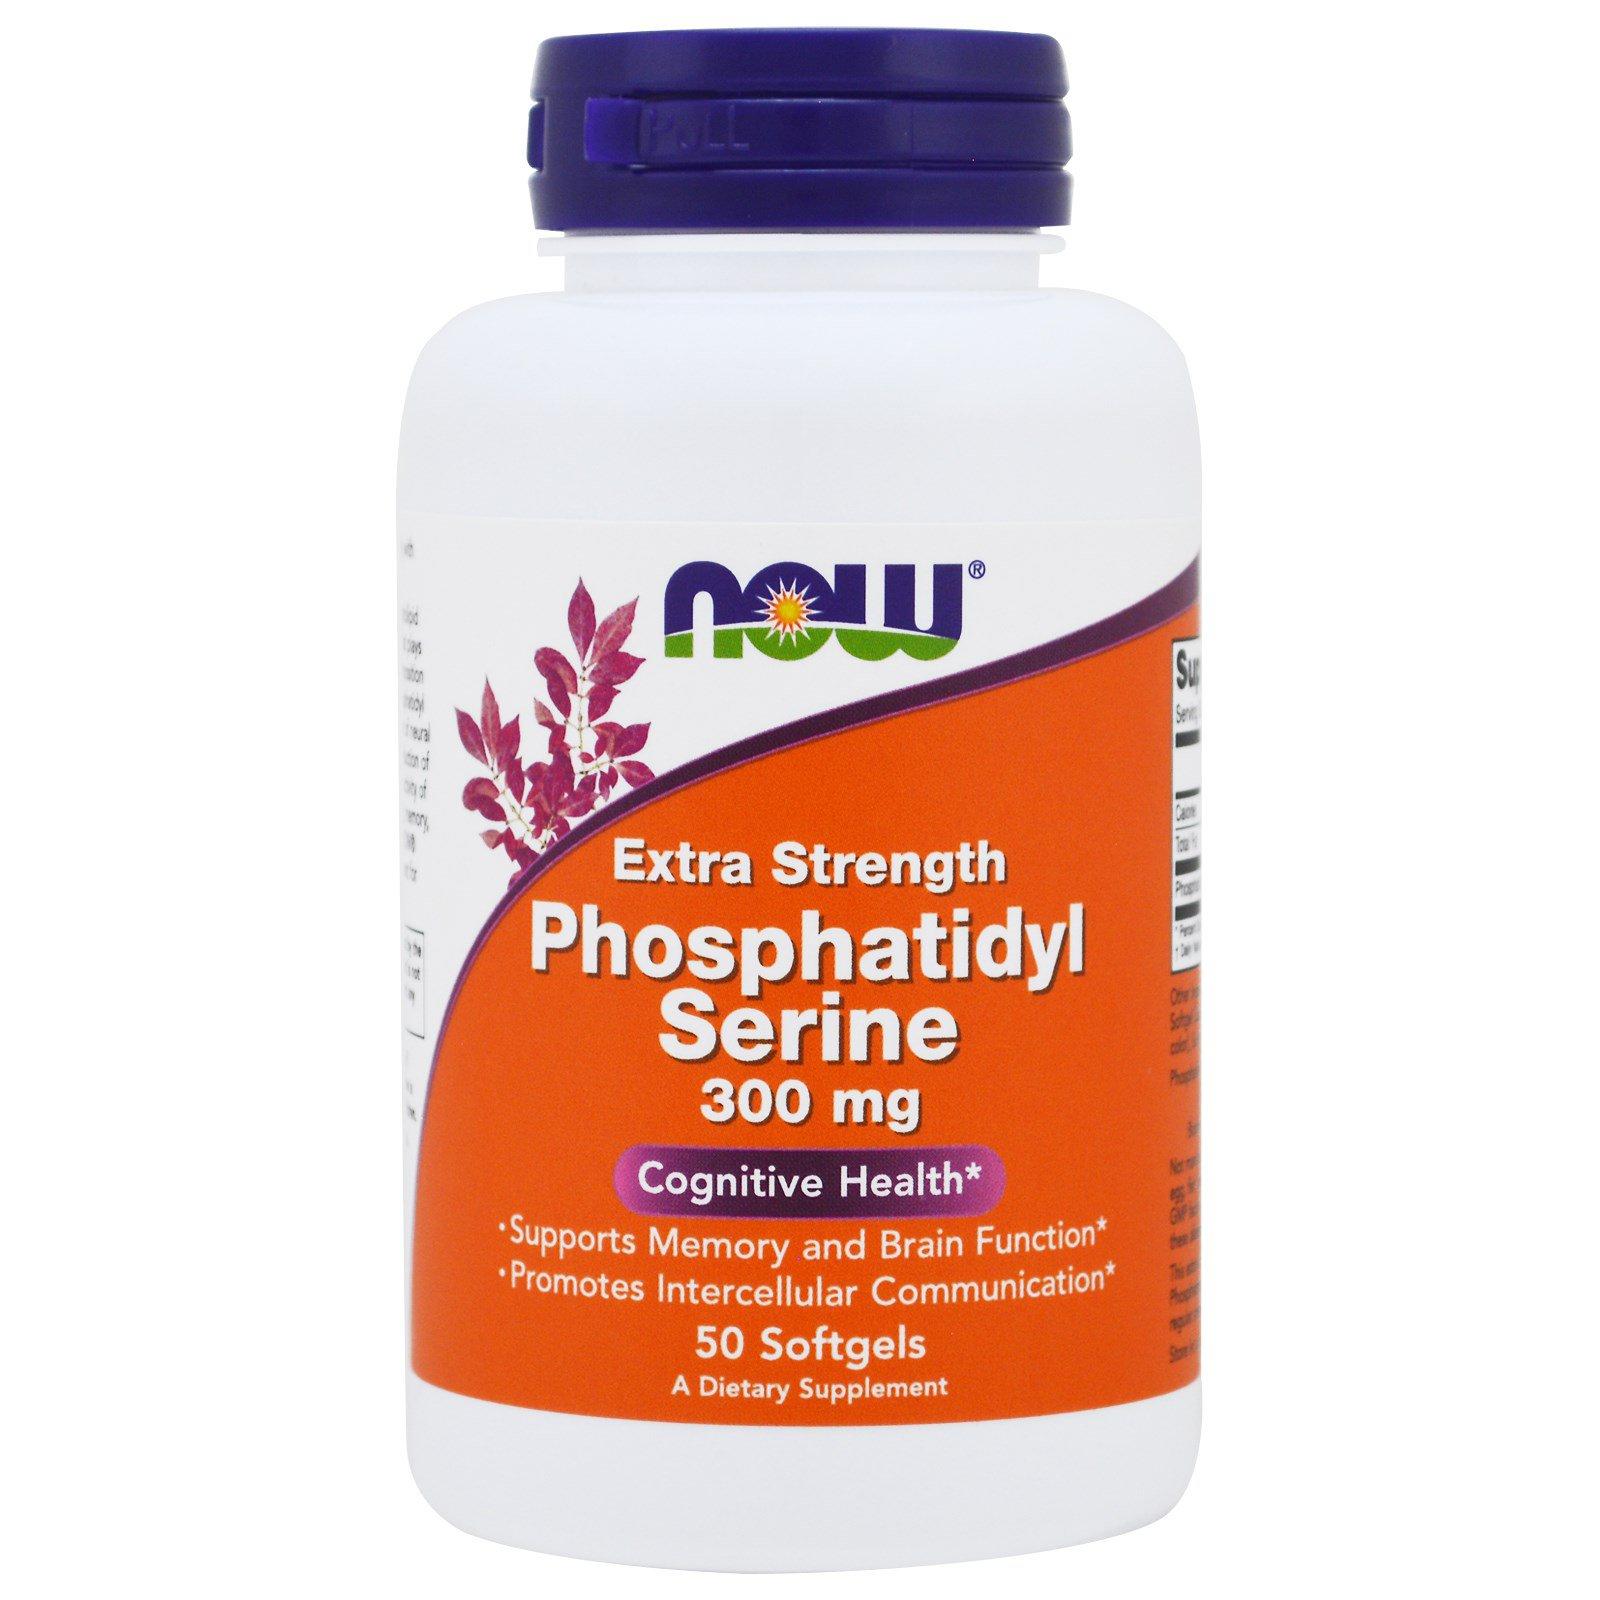 Image of Extra Strength Phosphatidyl Serine- 300 mg (50 softgels) - Now Foods 0733739023926